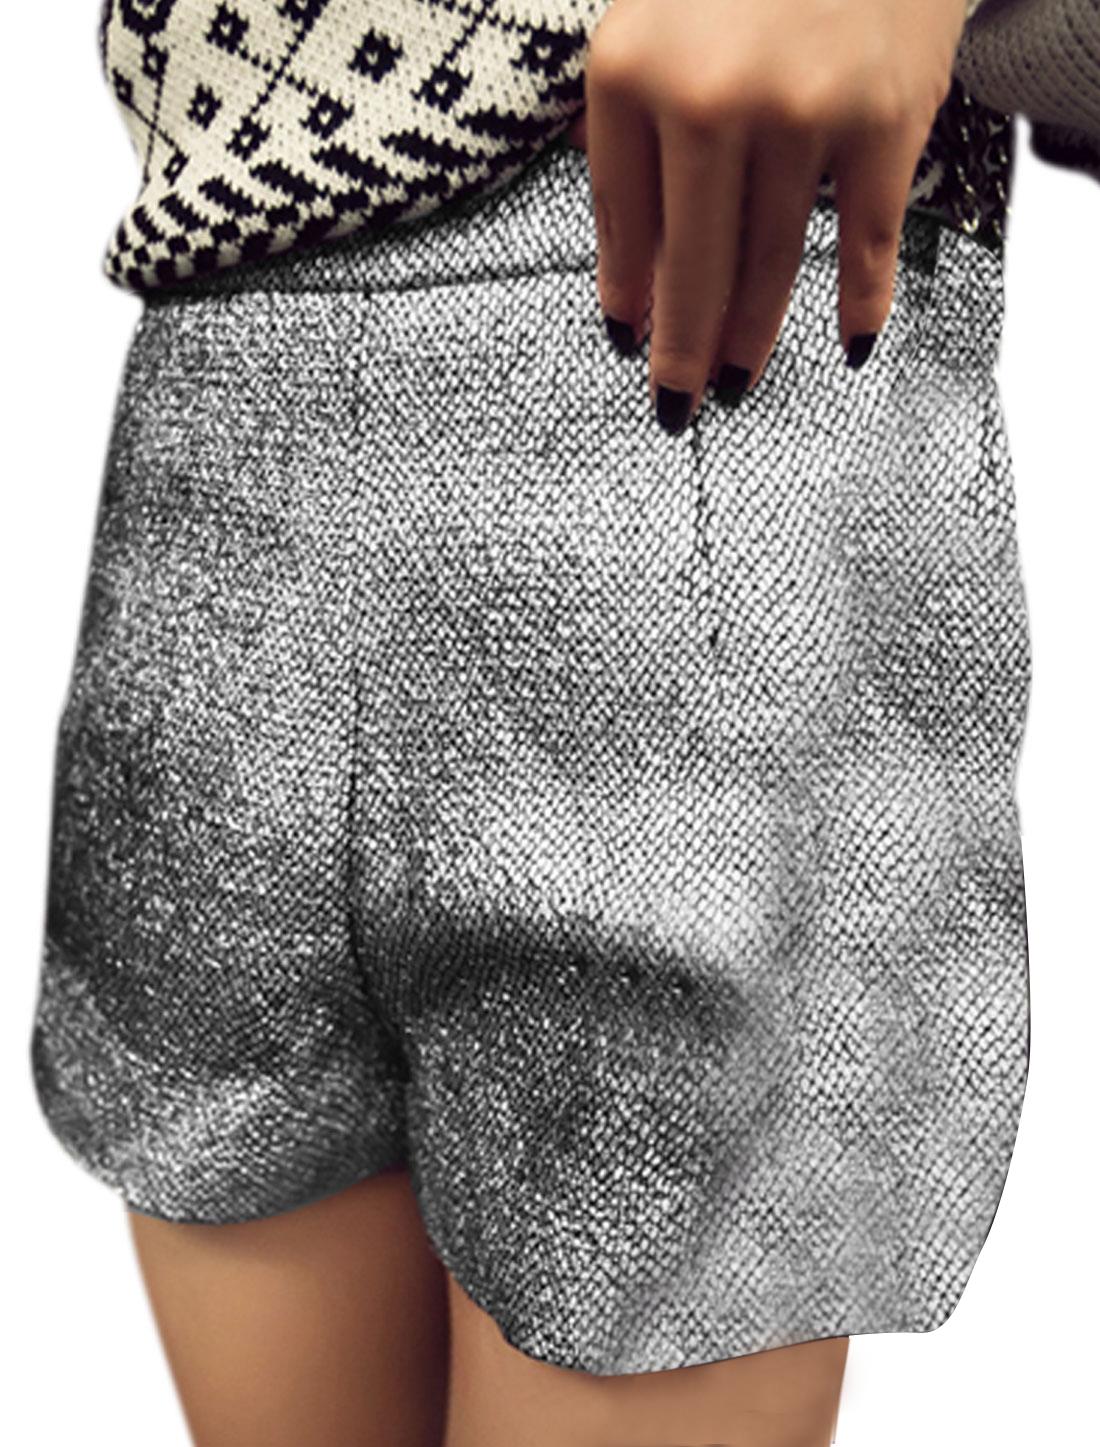 Women Shinny Snakeskin Pattern Natural Waist Shorts Silver Tone S